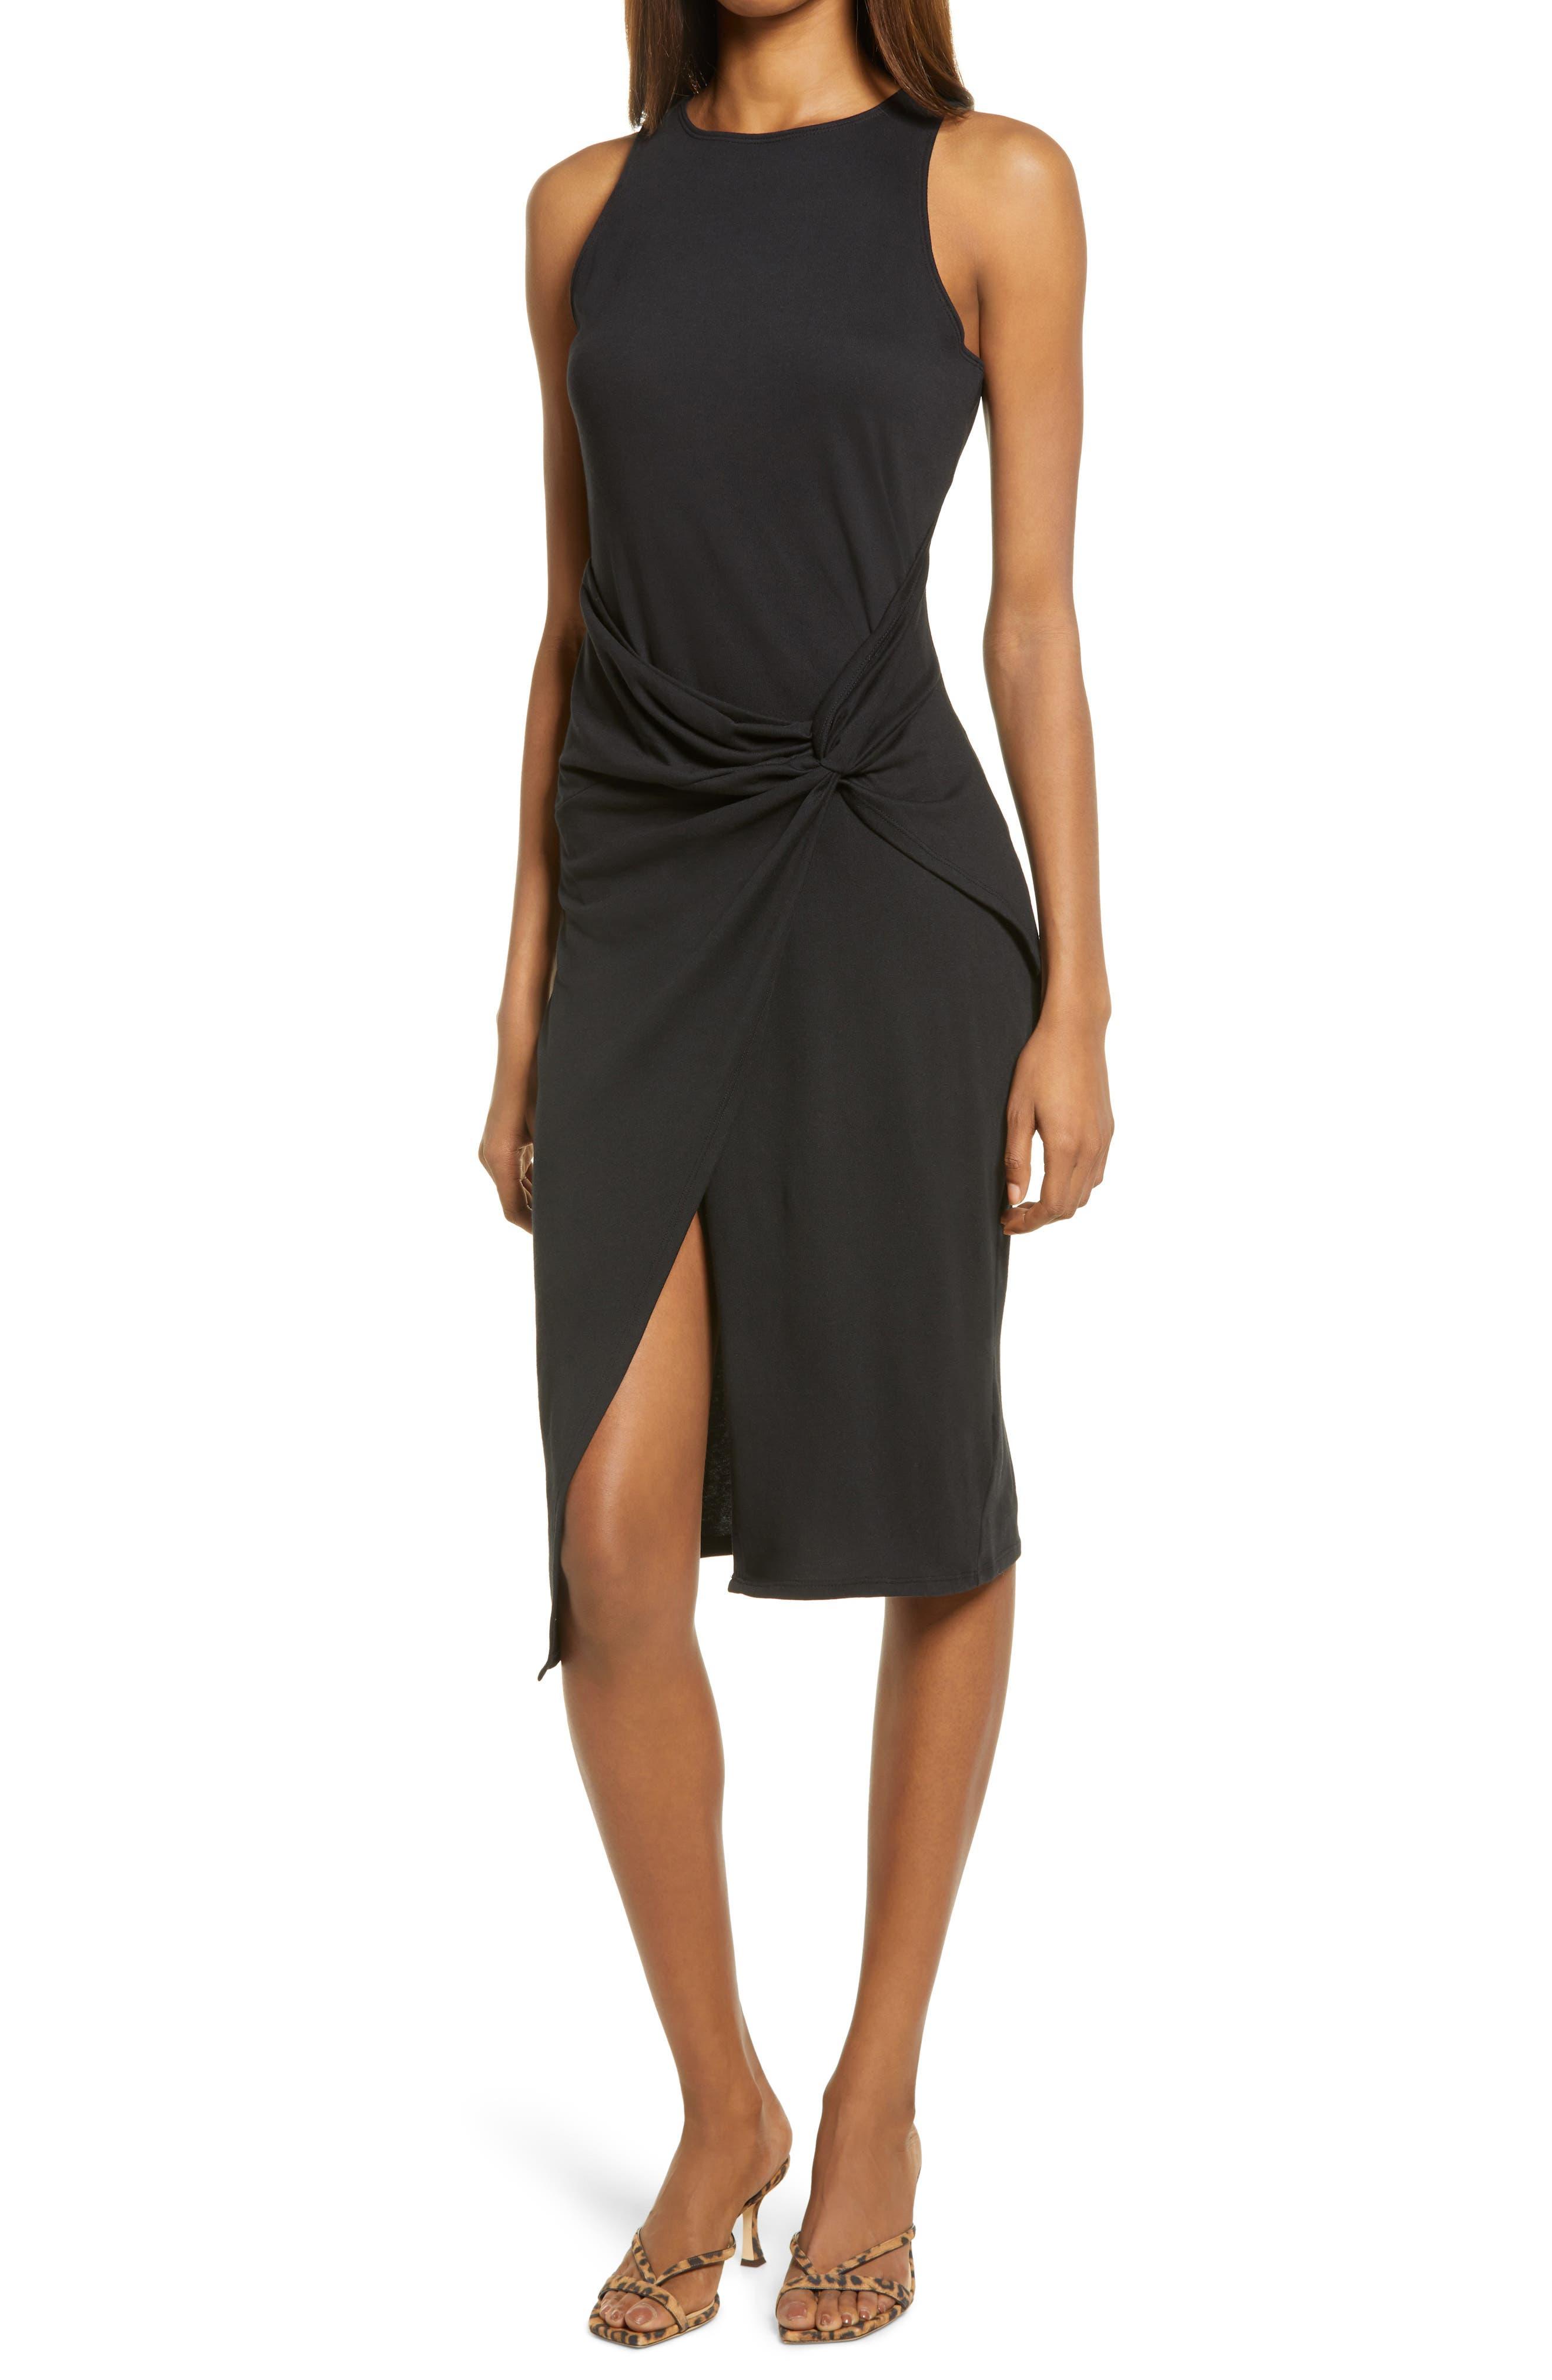 Image of Chelsea28 Twist Detail Mdi Dress